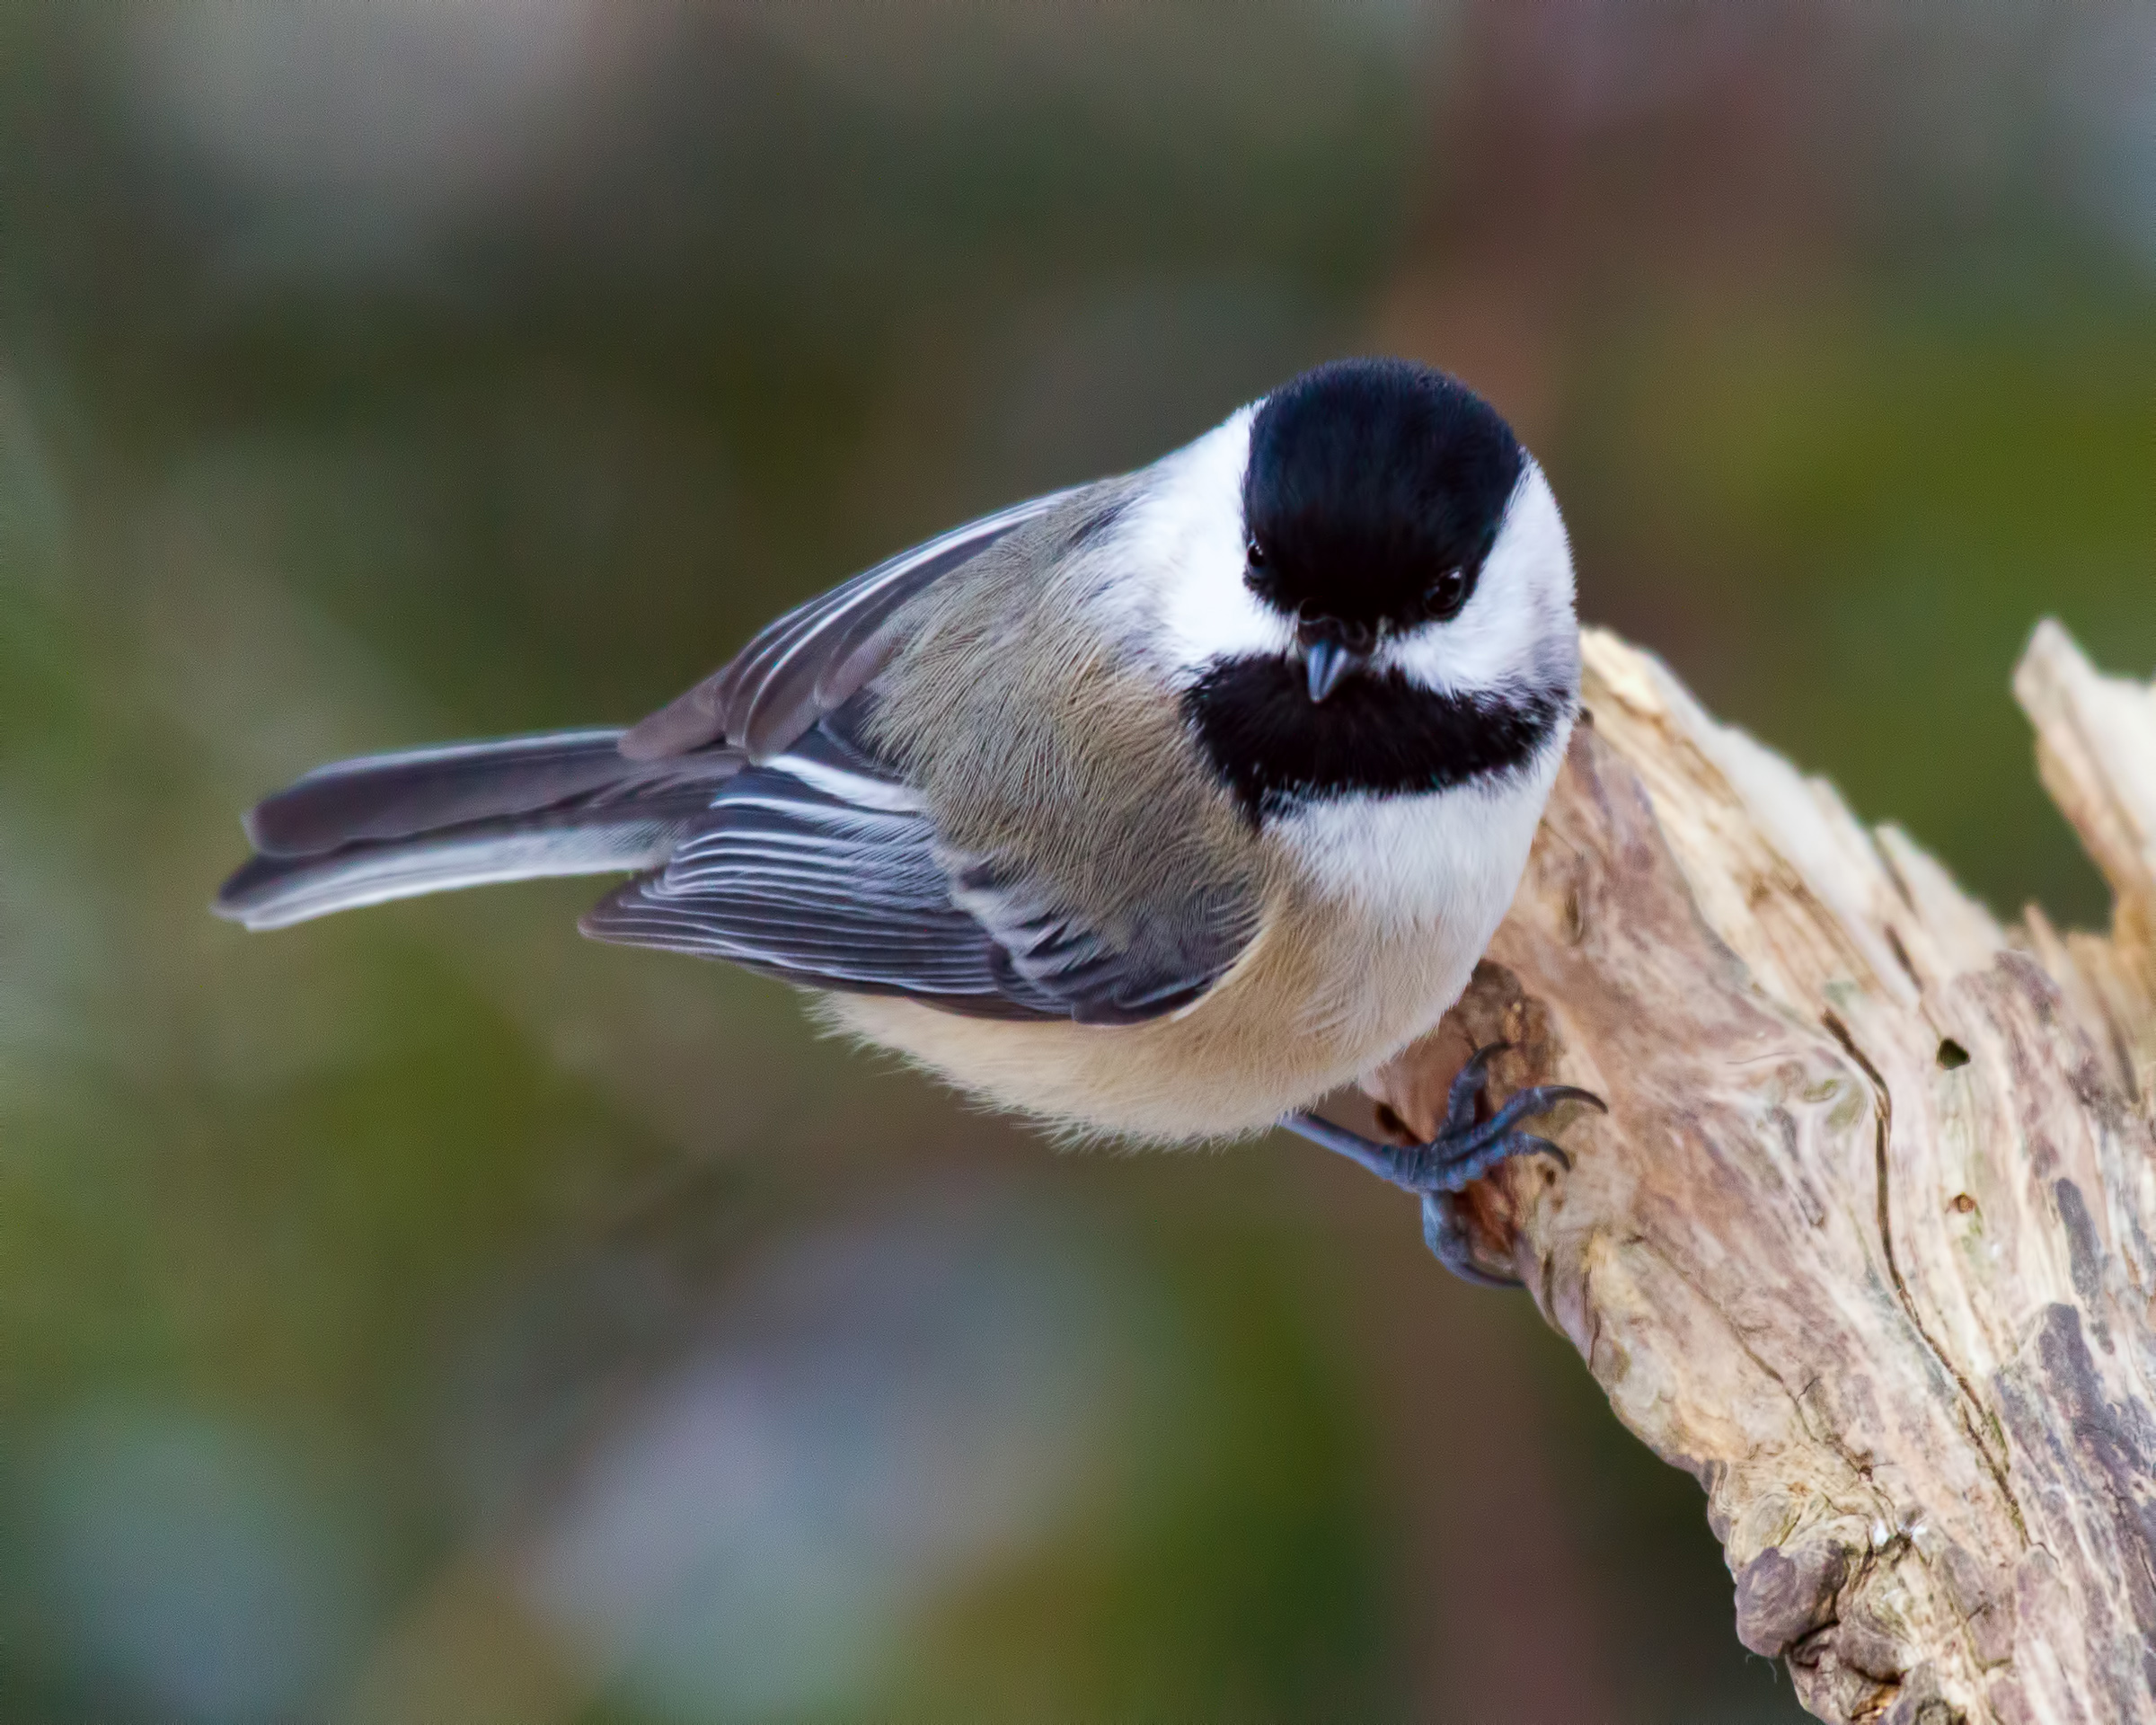 Bird, America, Ornithology, Wildlife, Wilderness, HQ Photo